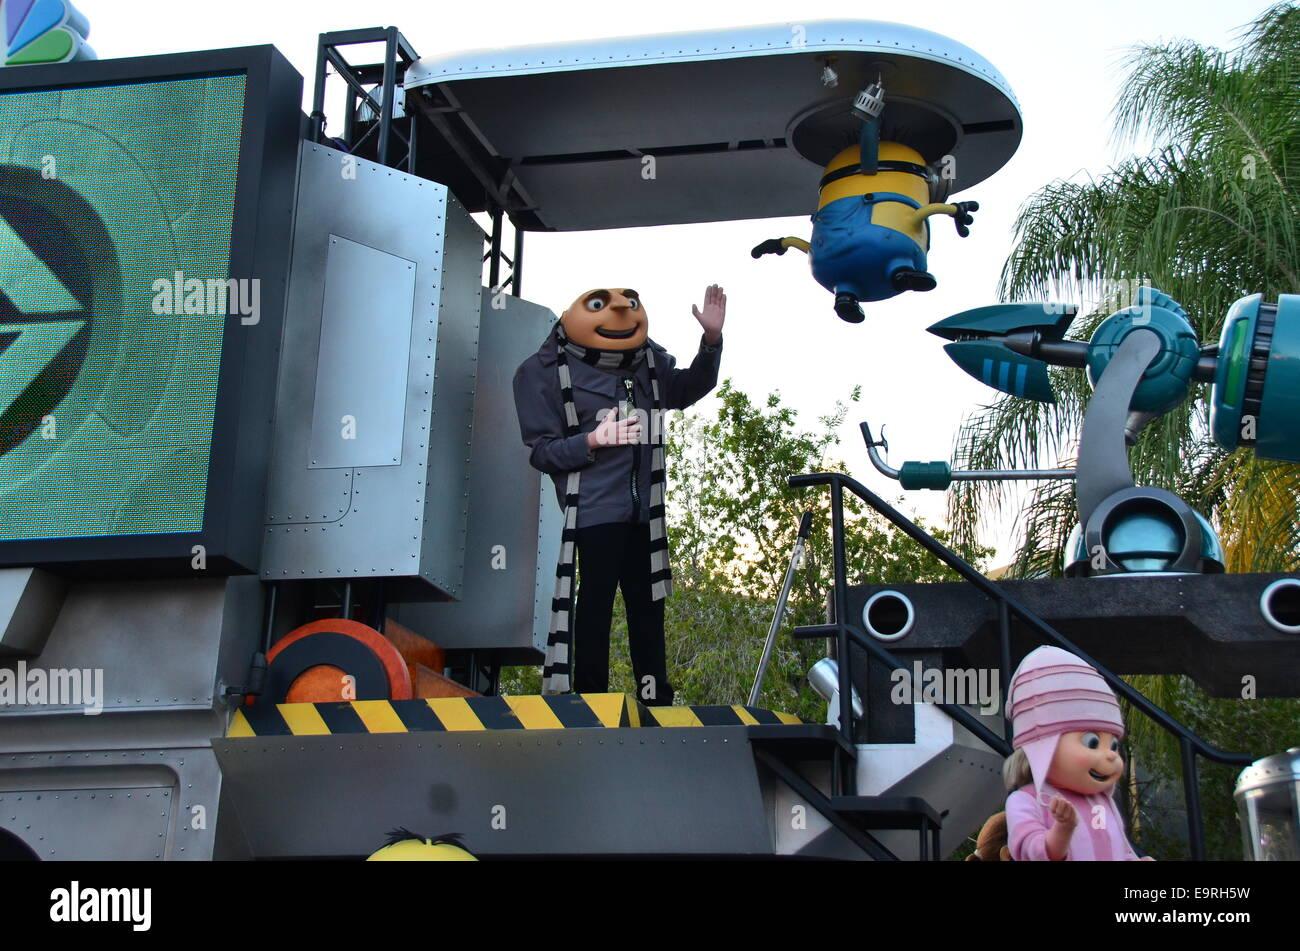 Despicable Me Minion Mayhem the 3D Ultra HD digital animation adventure at Universal Studio's Orlando, Florida. - Stock Image